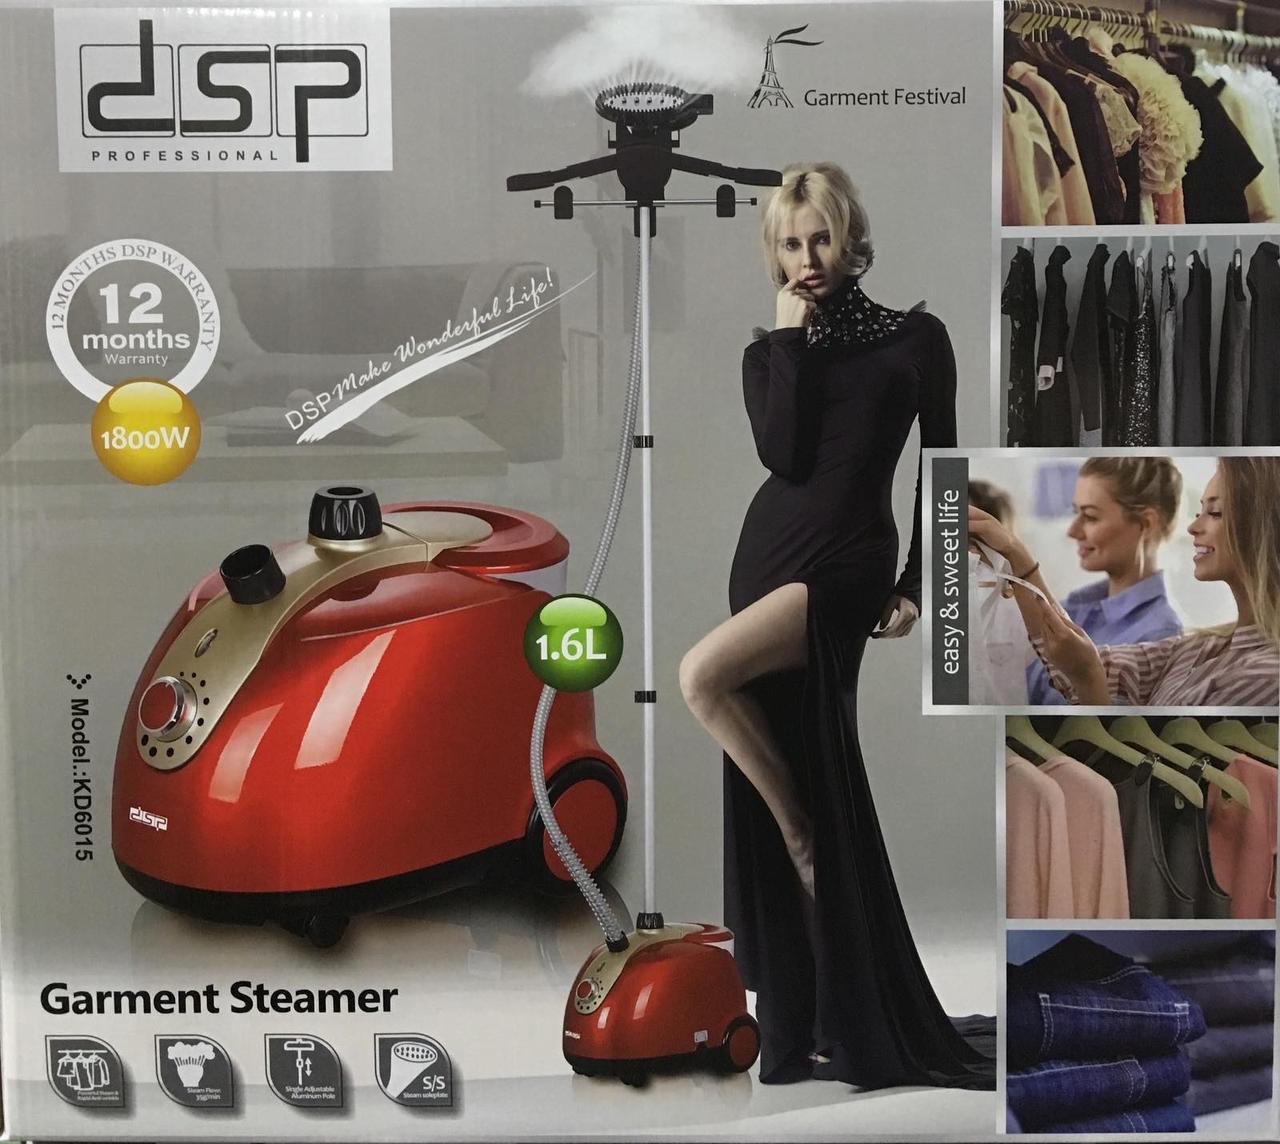 Отпариватель для одежды DSPKD6015, 1800W 1,6 L